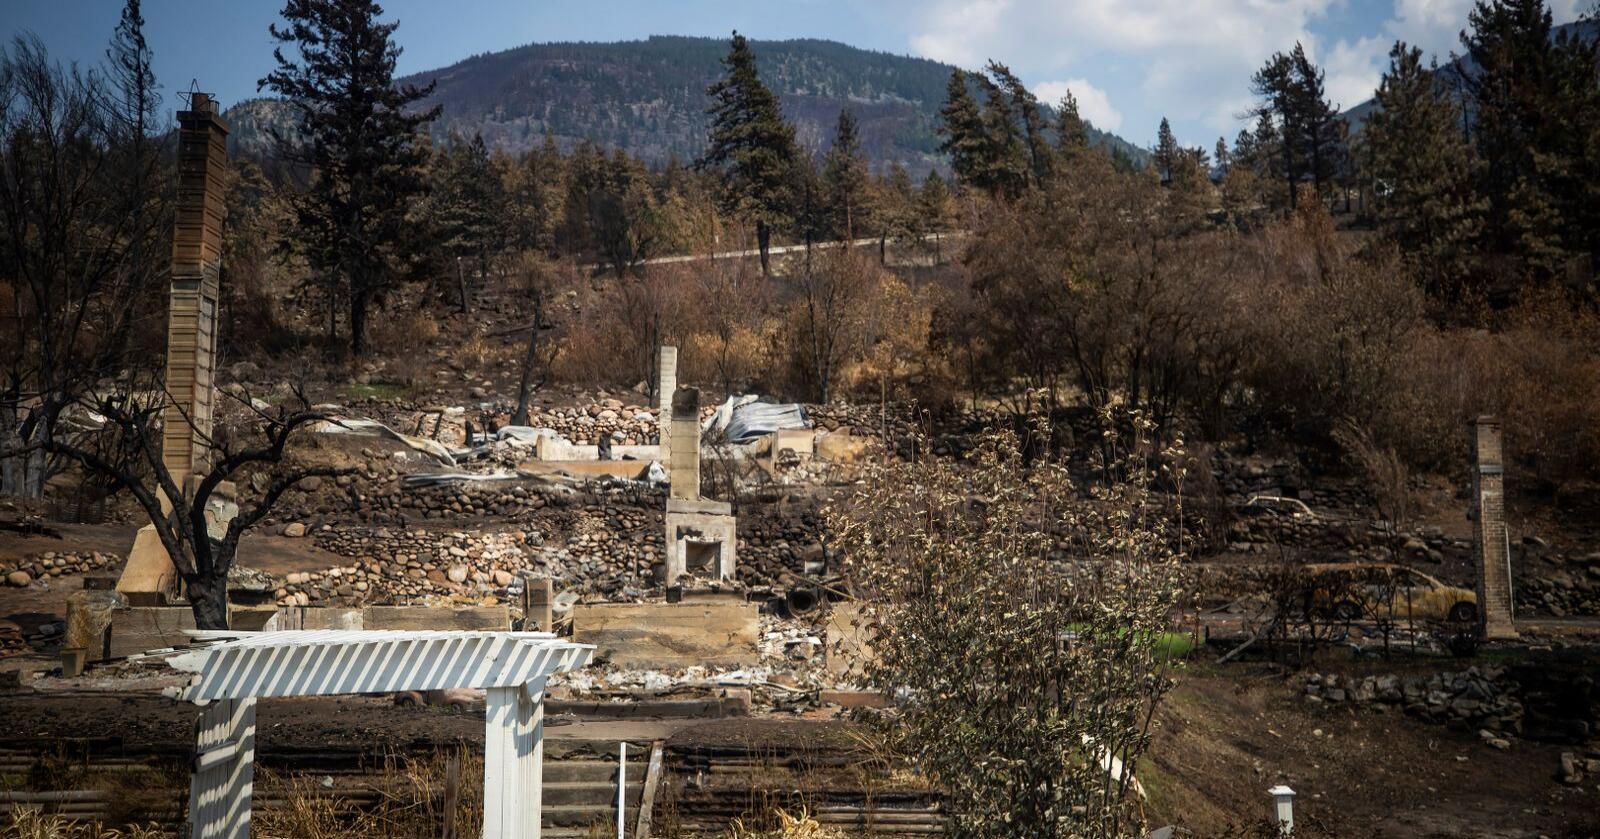 Ødelagte hus i Lytton i British Columbia etter skogbrannene som herjet tidligere i sommer. Foto: Darryl Dyck/The Canadian Press via AP / NTB